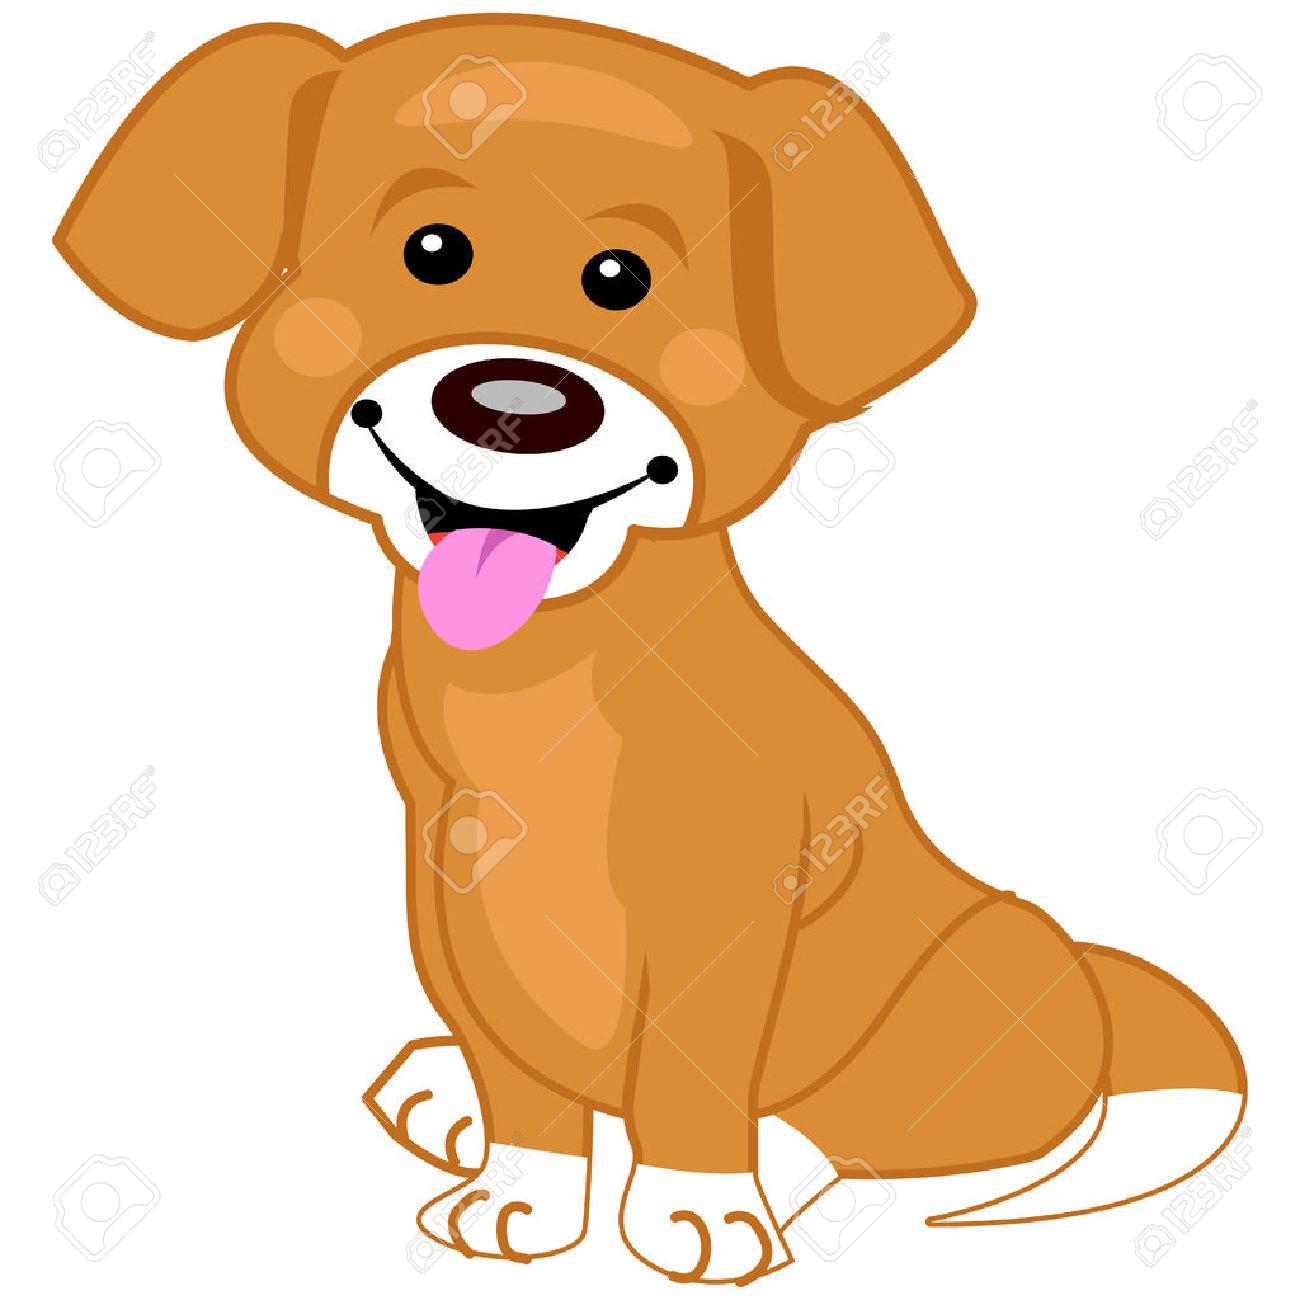 1300x1300 Golden Retriever Puppy Clip Art. Royalty Free Golden Retriever